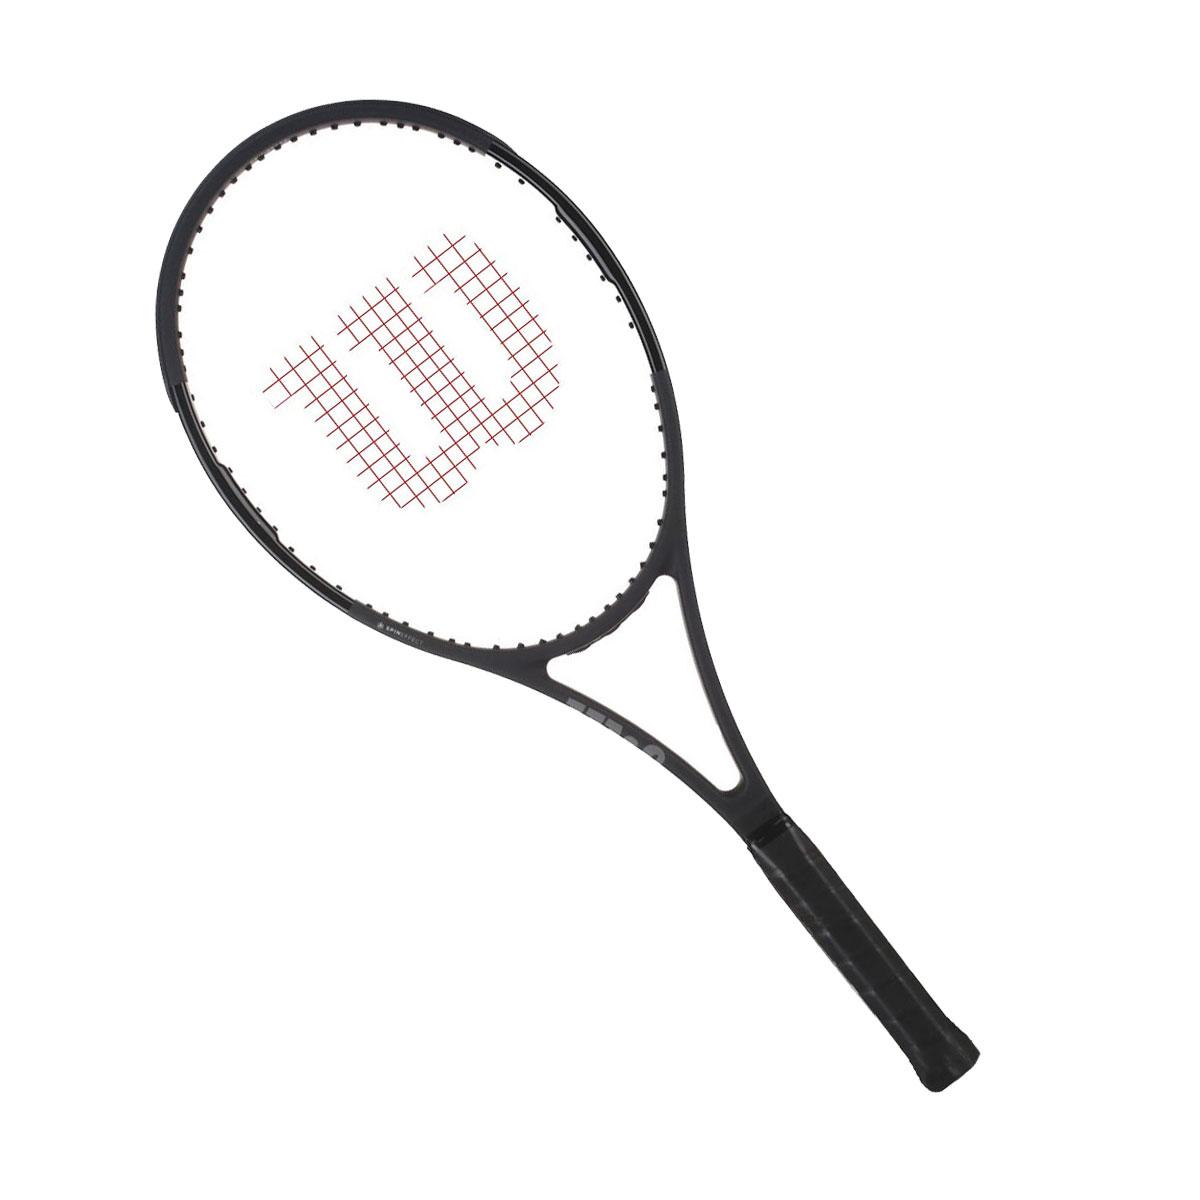 cde4dbed3 Raquete de Tênis Wilson Pro Staff 97 LS - Empório do Tenista